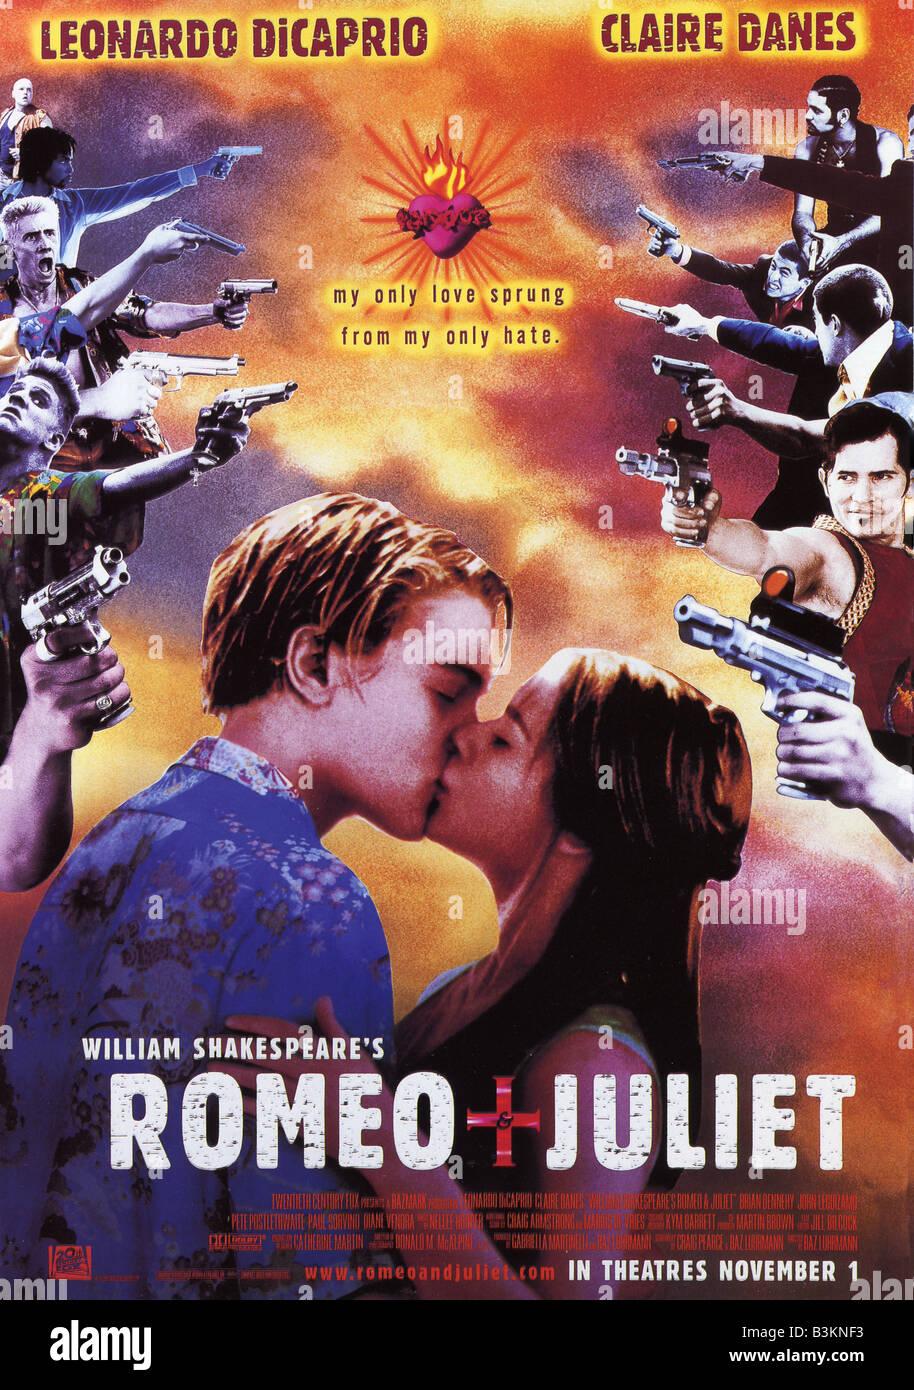 WILLIAM SHAKESPEARE'S ROMEO AND JULIET Poster für das Jahr 1996 TCF/Bazmark film mit Leonardo DiCaprio Stockbild